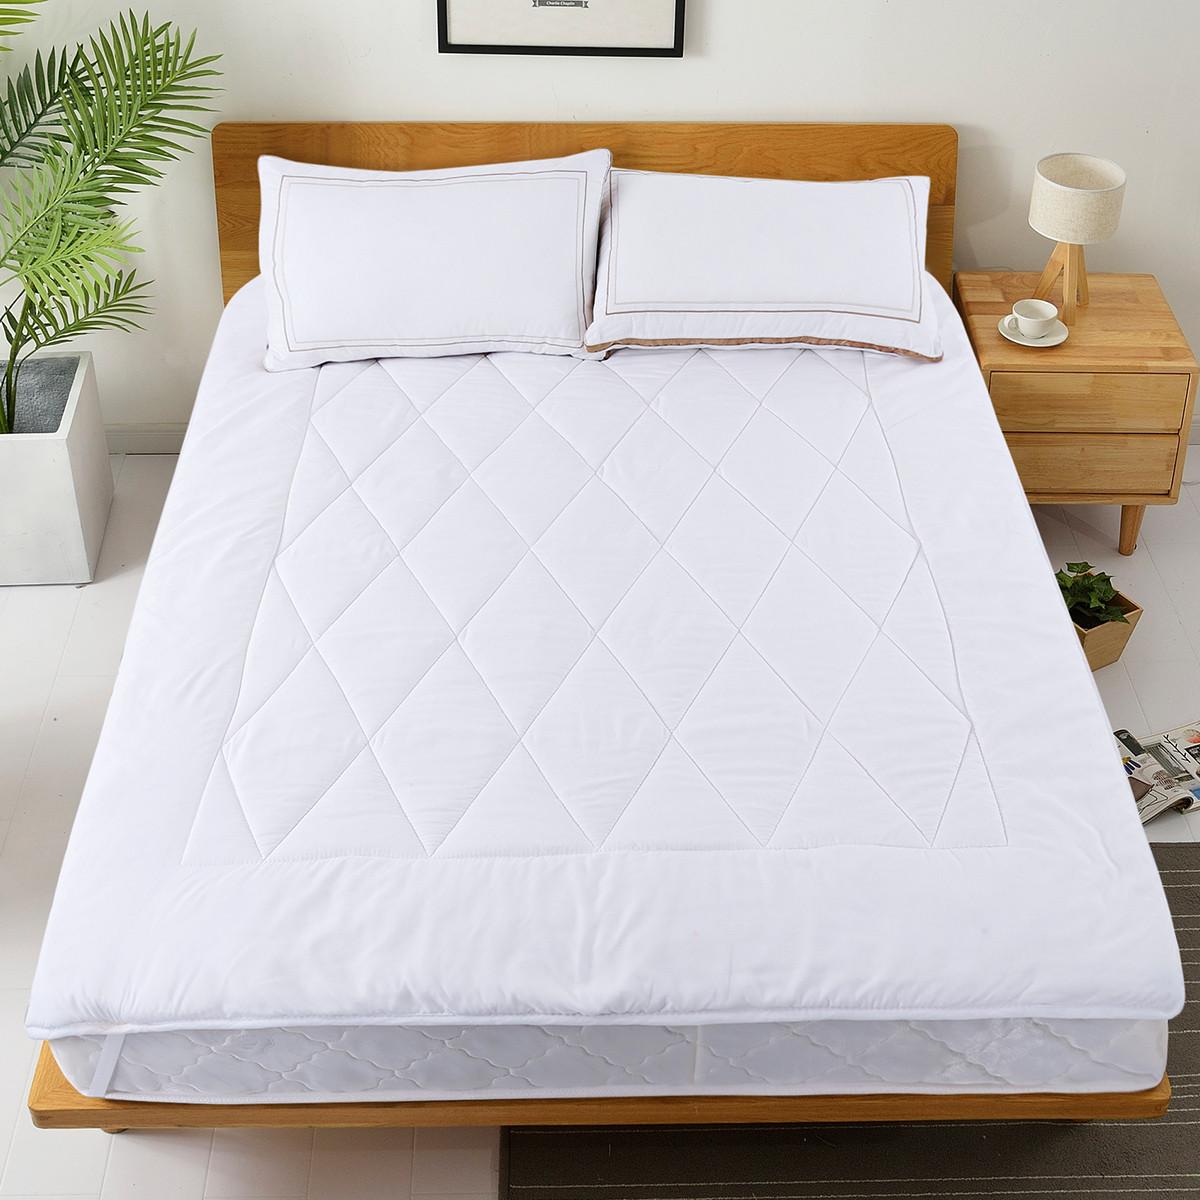 Ramada【年底清仓】柔系列磨毛床褥子榻榻米床垫宿舍床褥床笠薄床垫COLOR白色